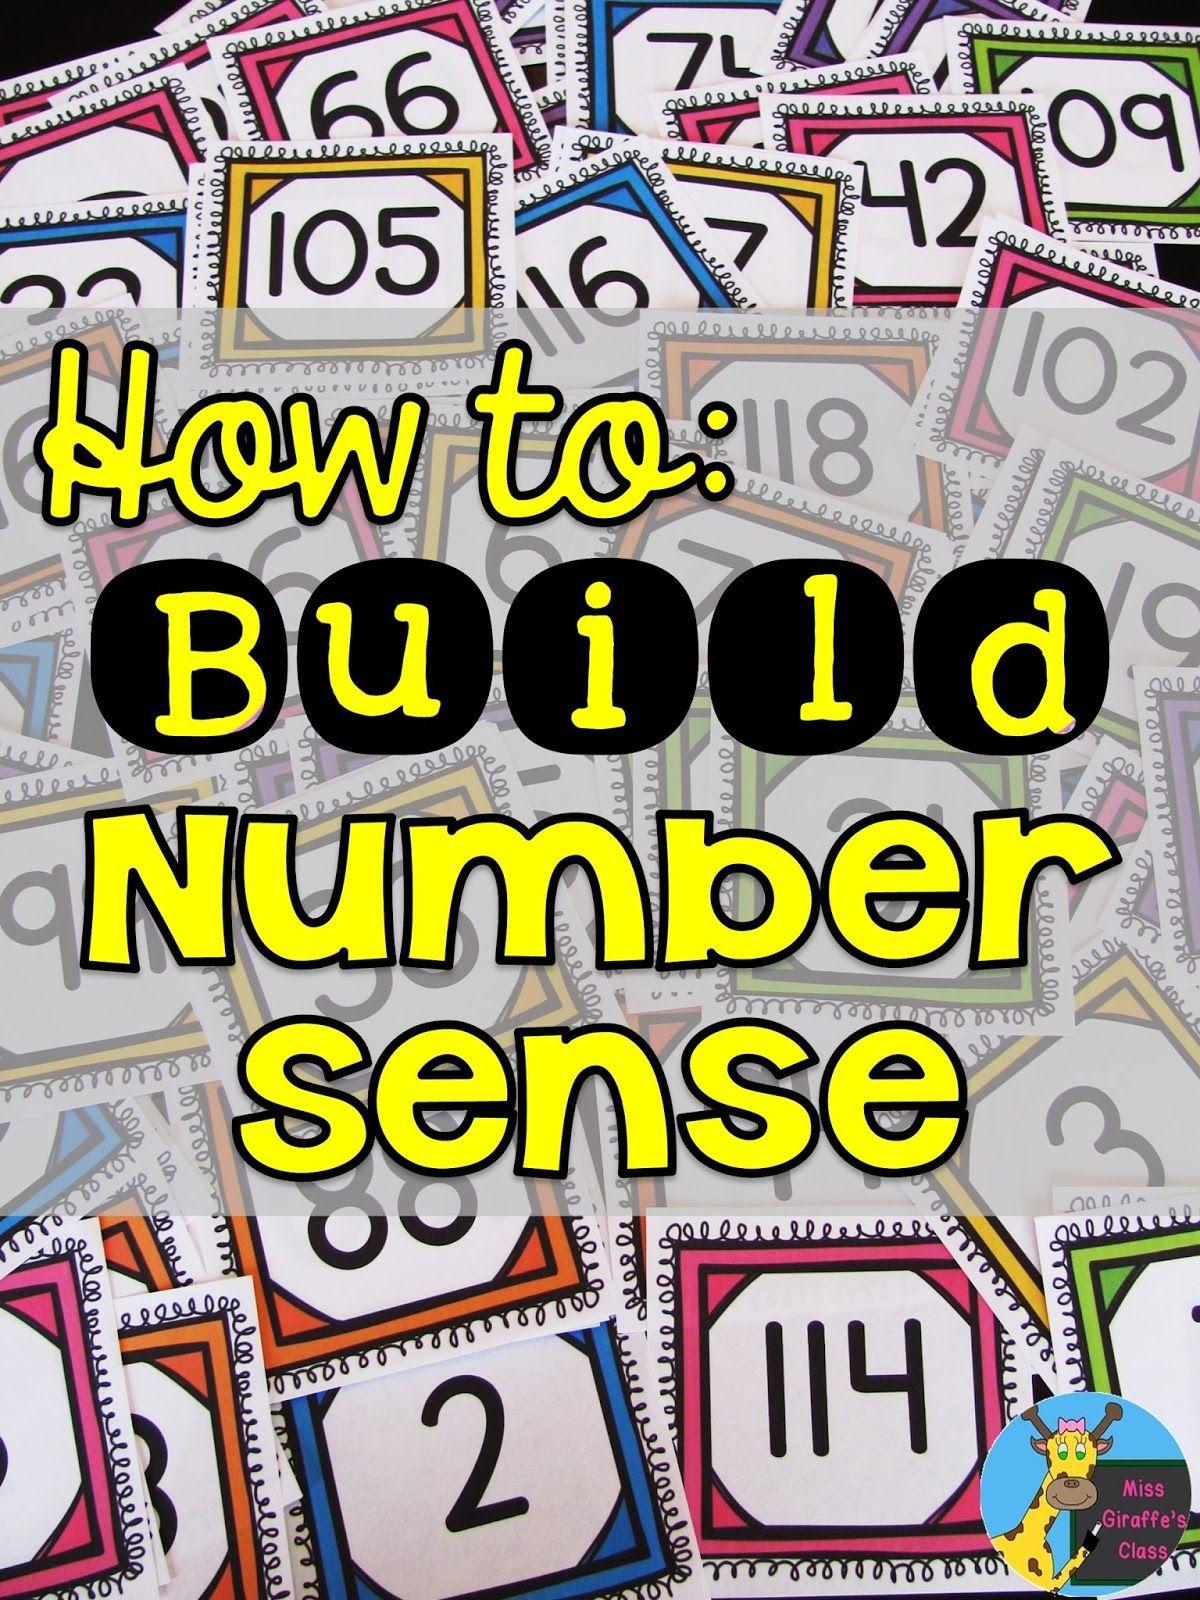 Miss Giraffe\'s Class: Building Number Sense in First Grade. Some ...